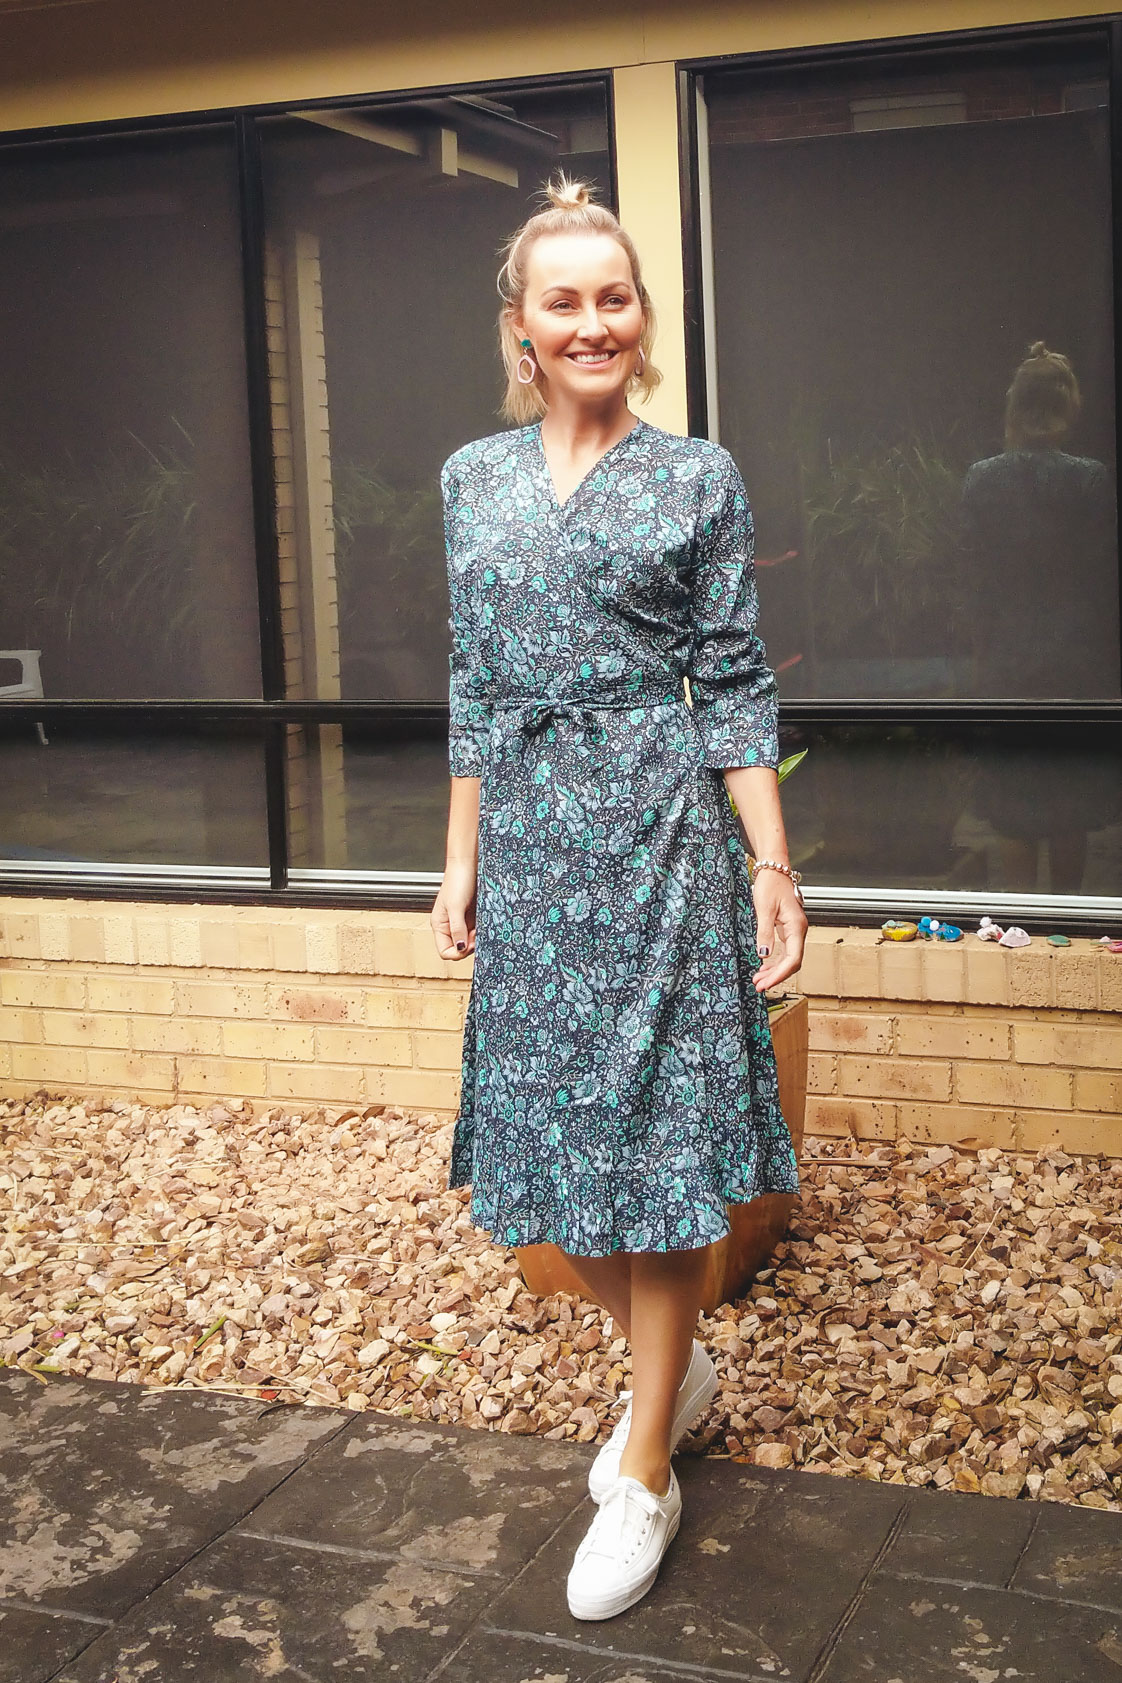 Greta Rayon Wrap Dress - Lark Print